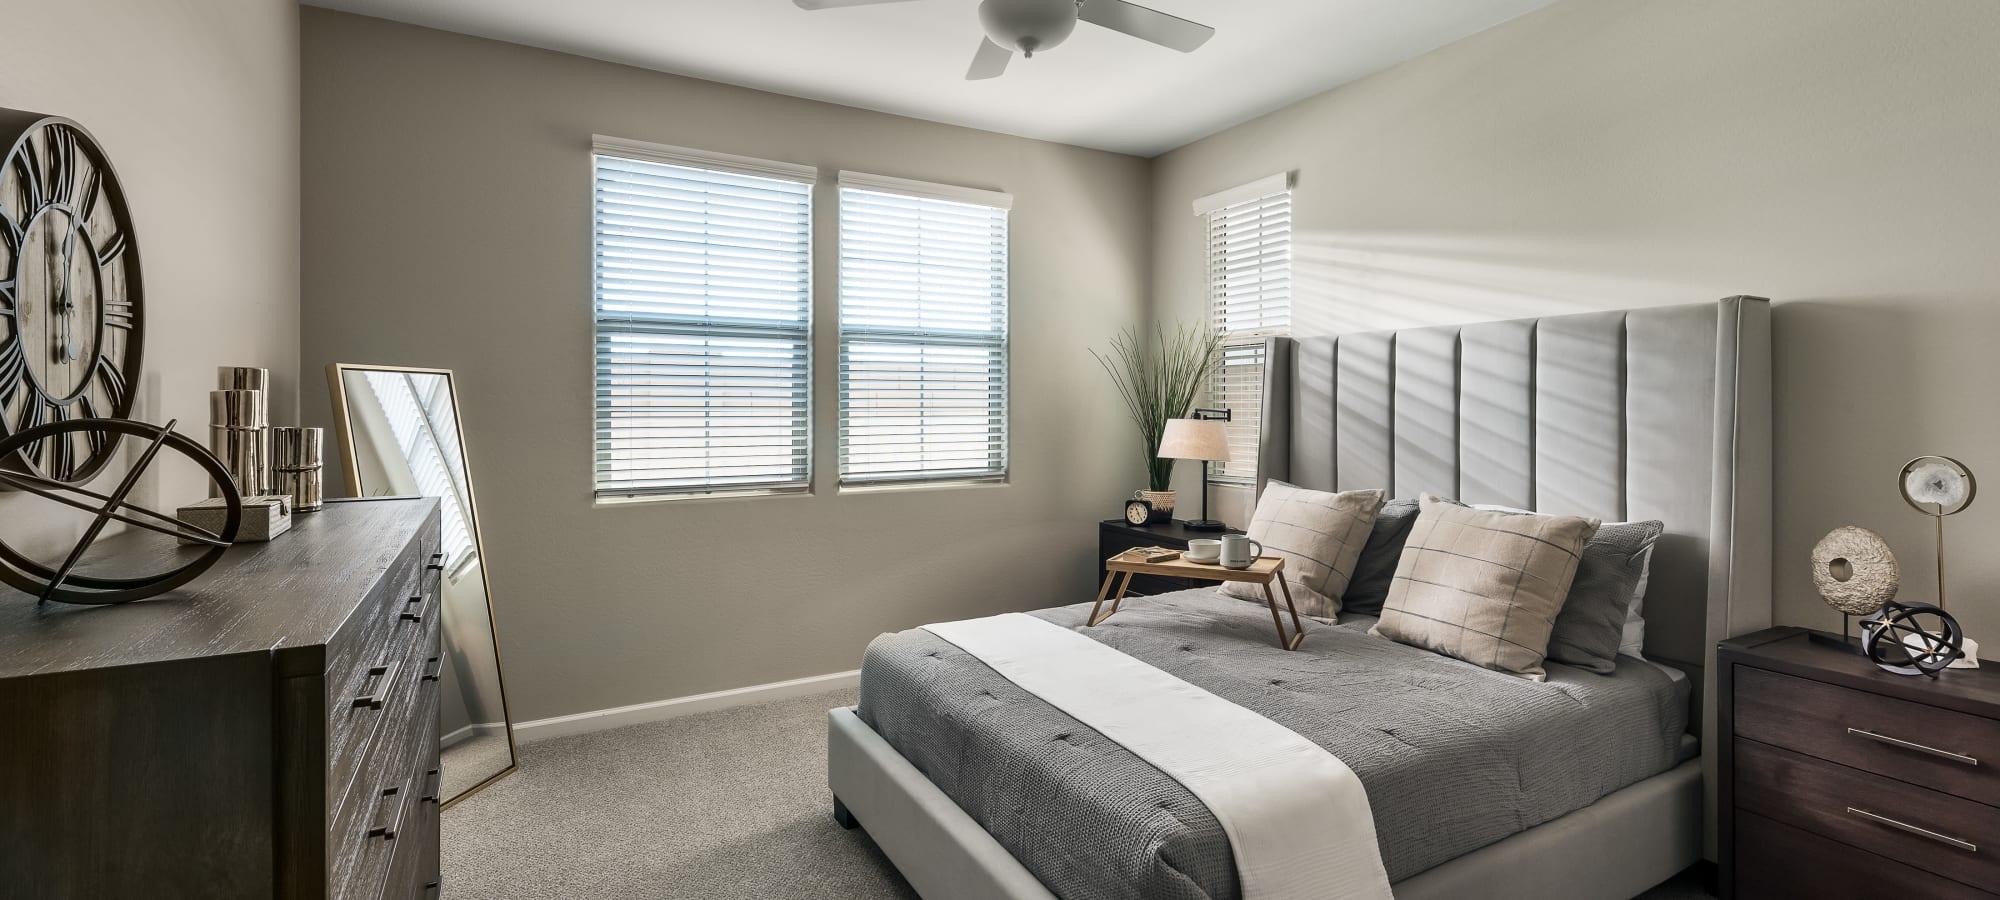 Master Bedroom at Las Casas at Windrose in Litchfield Park, Arizona